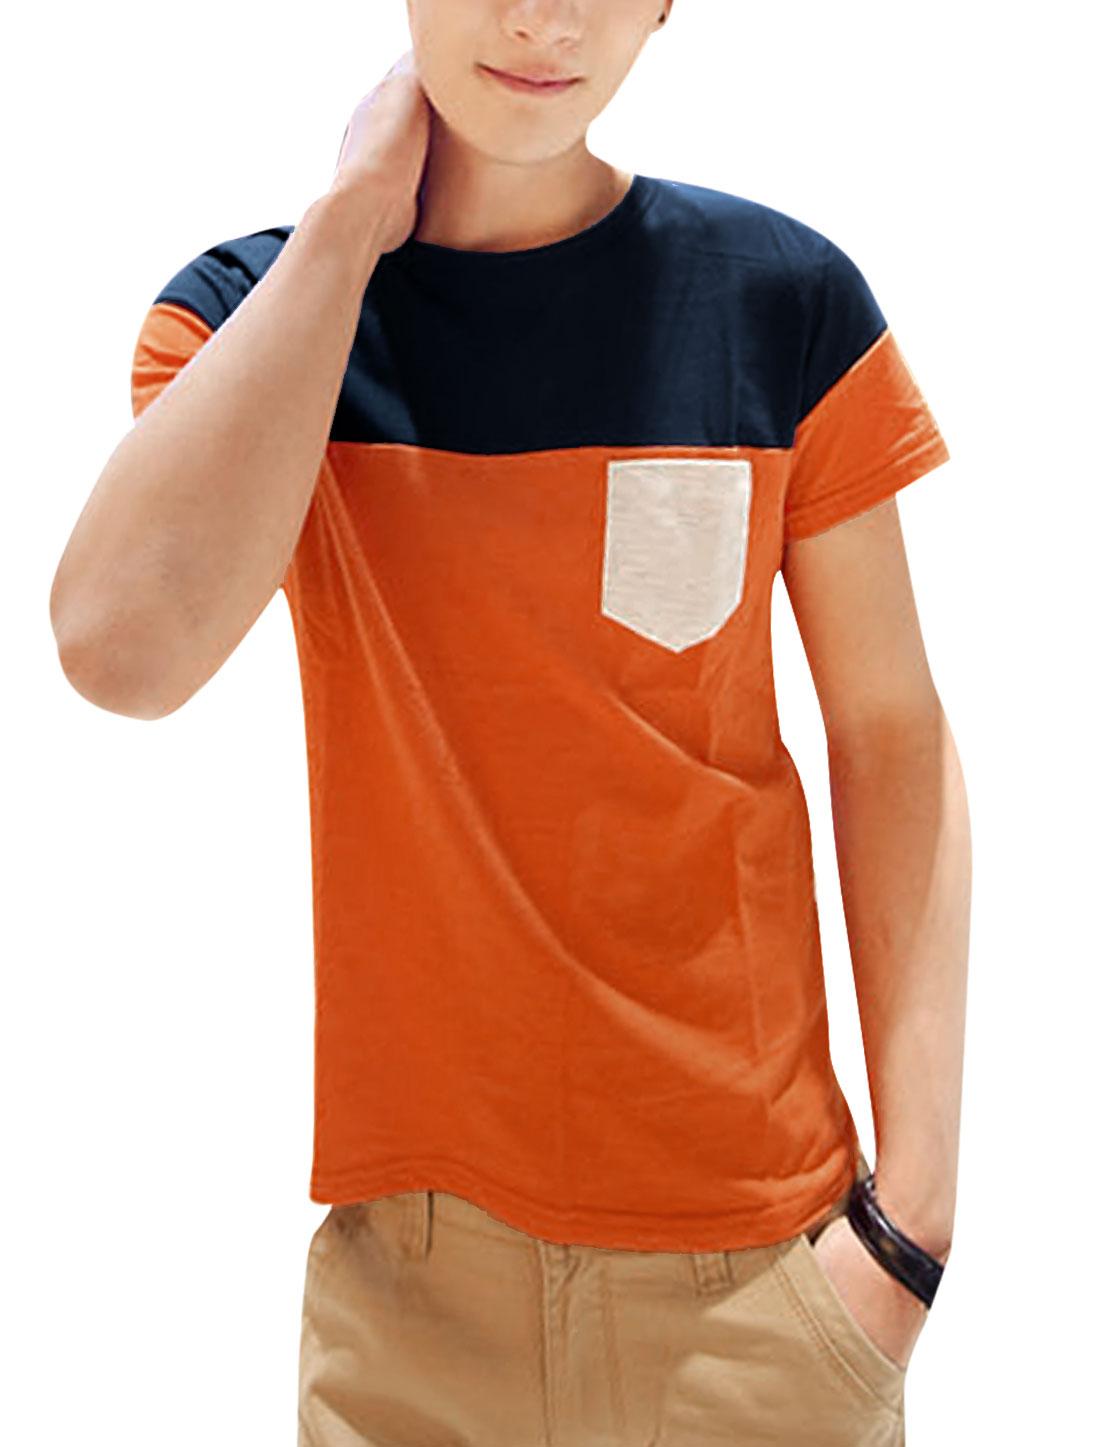 Men Short Sleeve Colorblock Panel Design T-Shirt Orange Navy Blue S